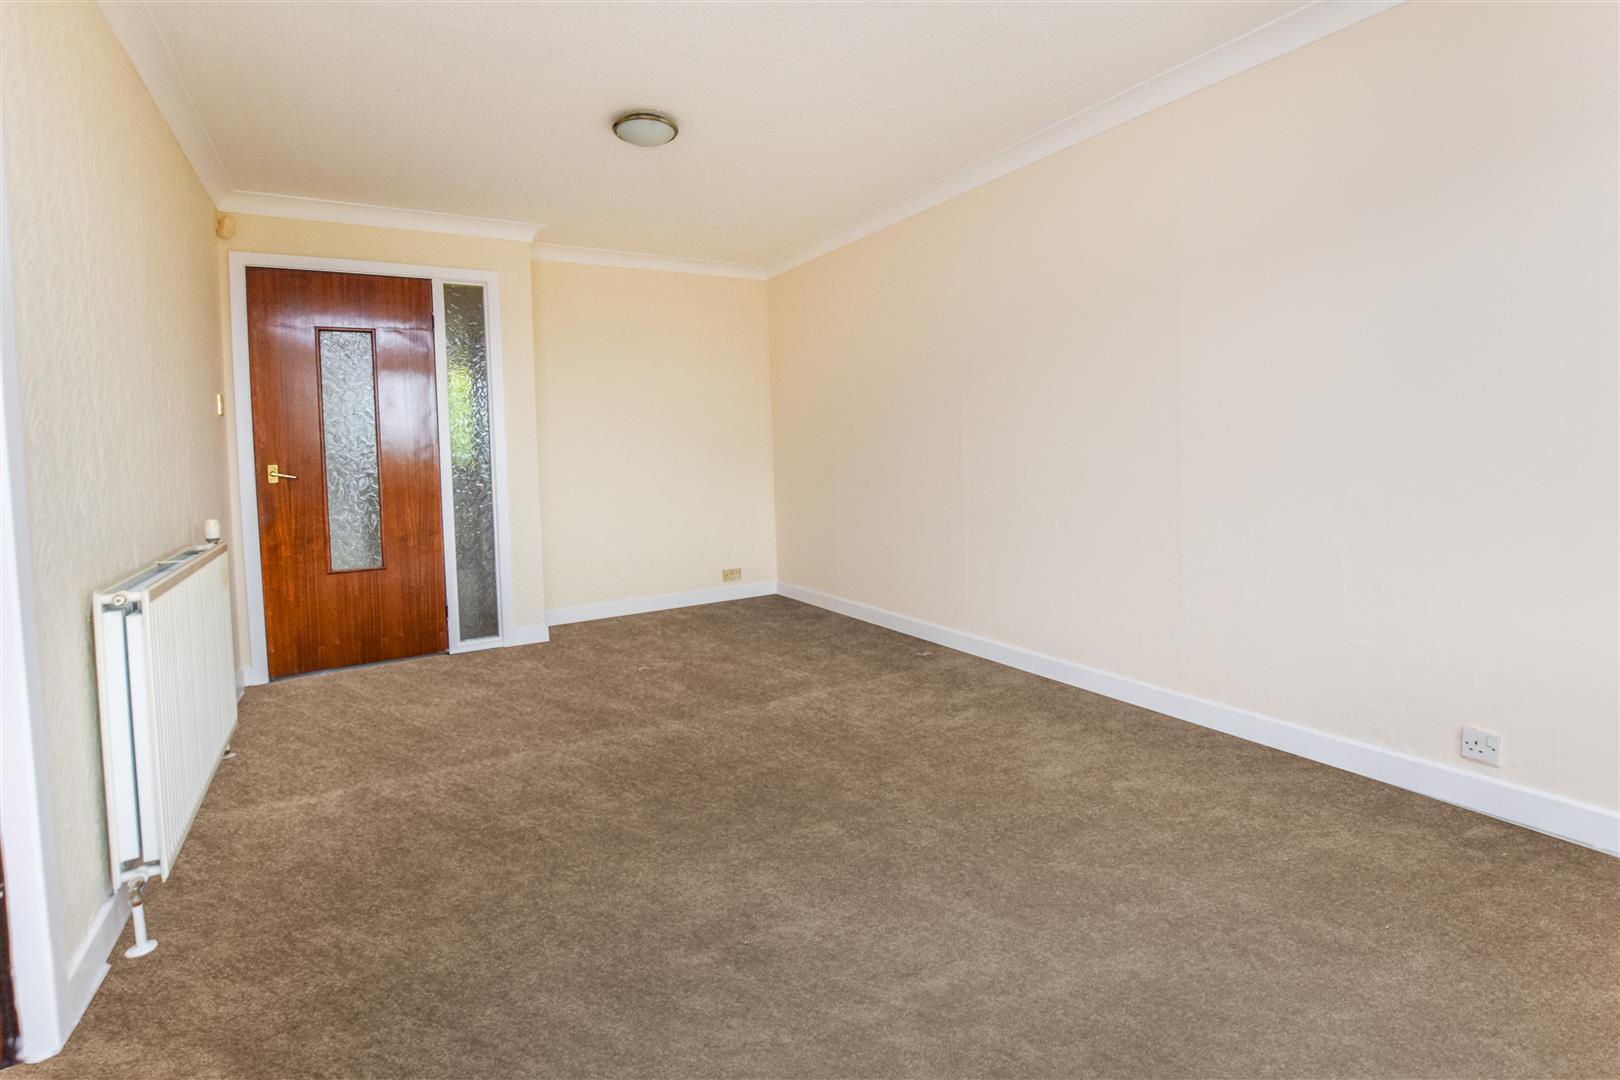 42, Elm Street, Errol, Perth, Perthshire, PH2 7SQ, UK